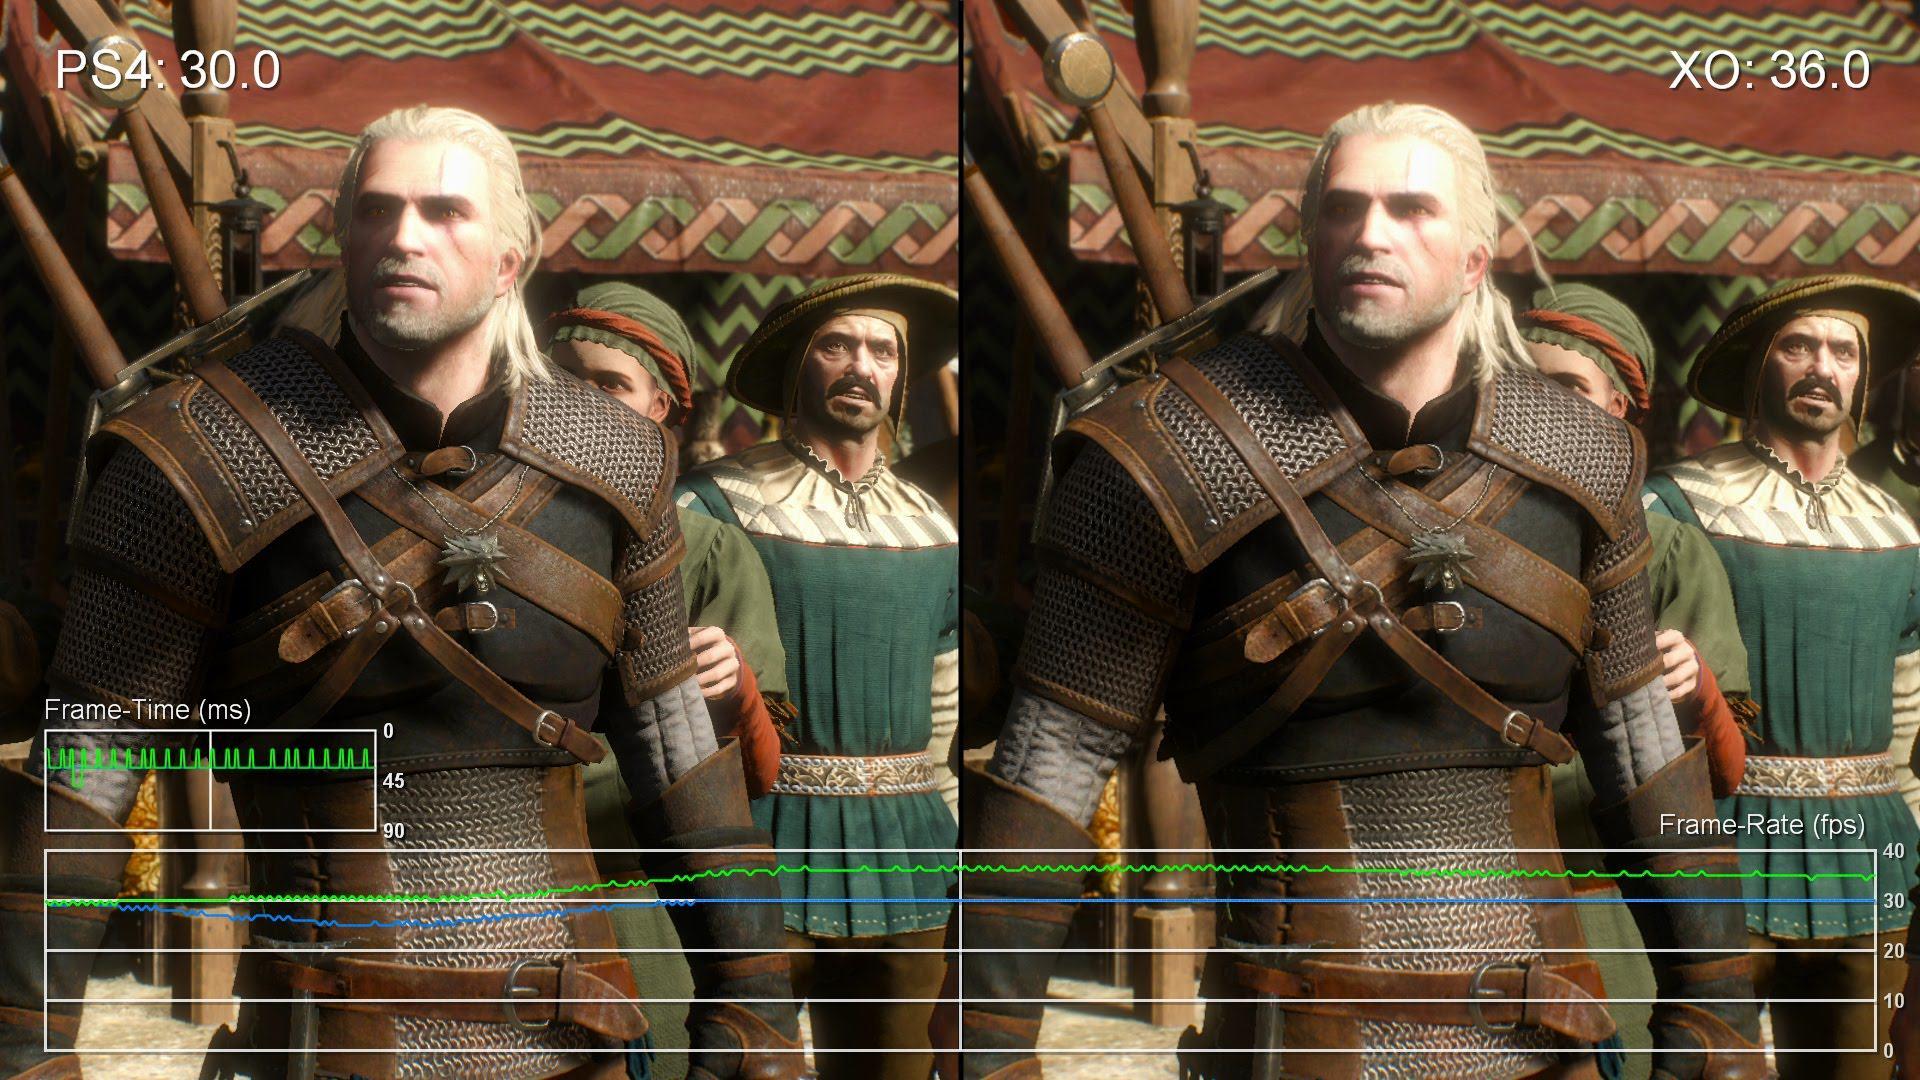 مقایسه ی گرافیکی The Witcher 3: Wild Hunt